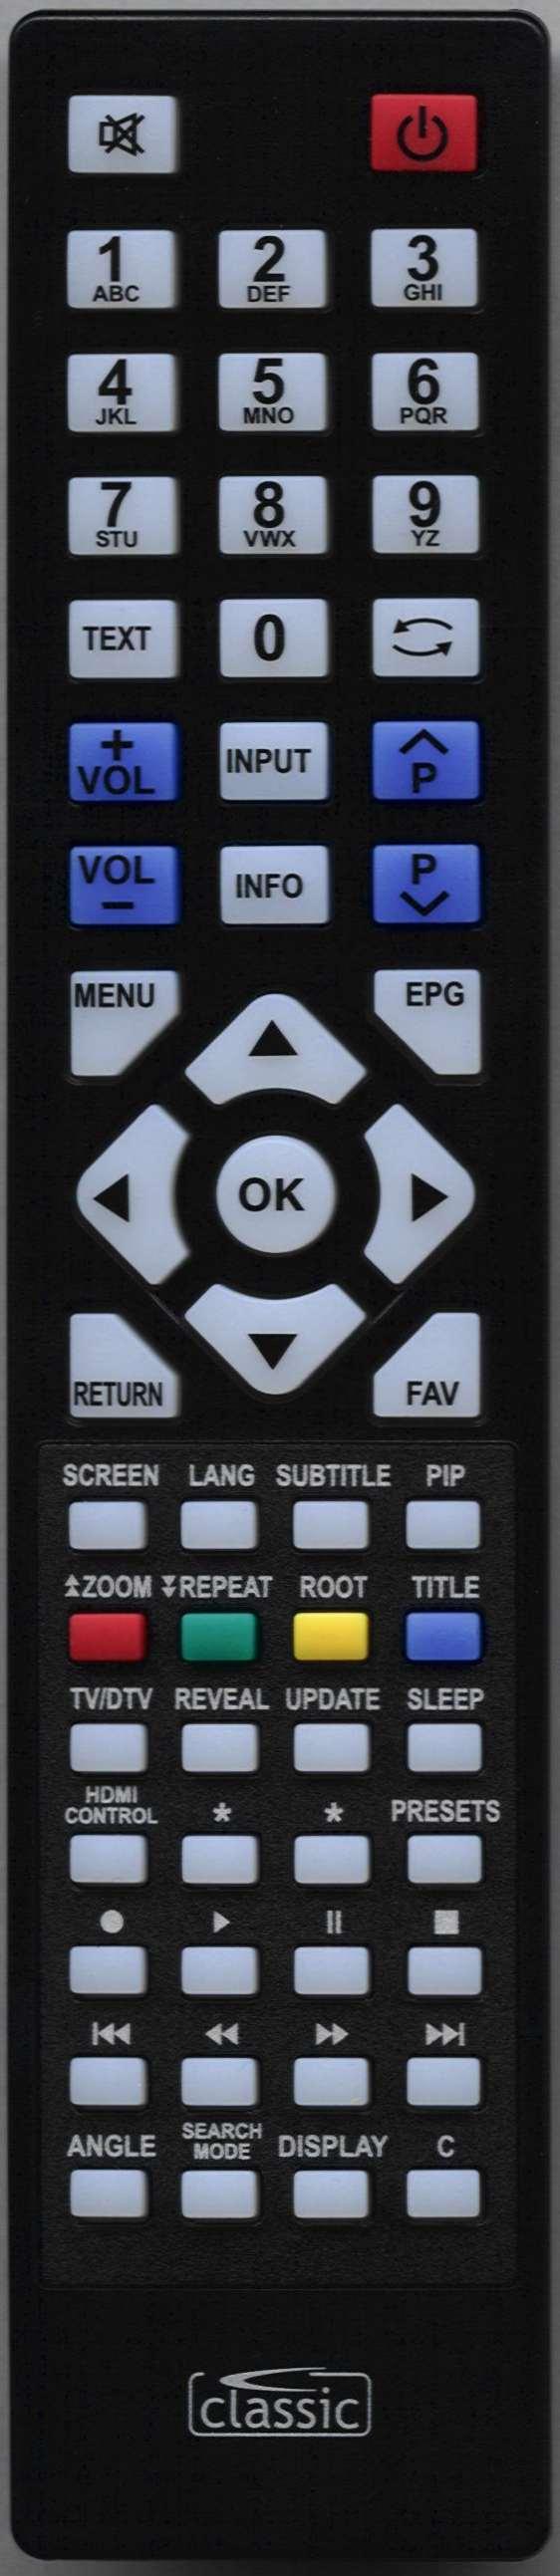 LUXOR LUX16822HDD Remote Control Alternative